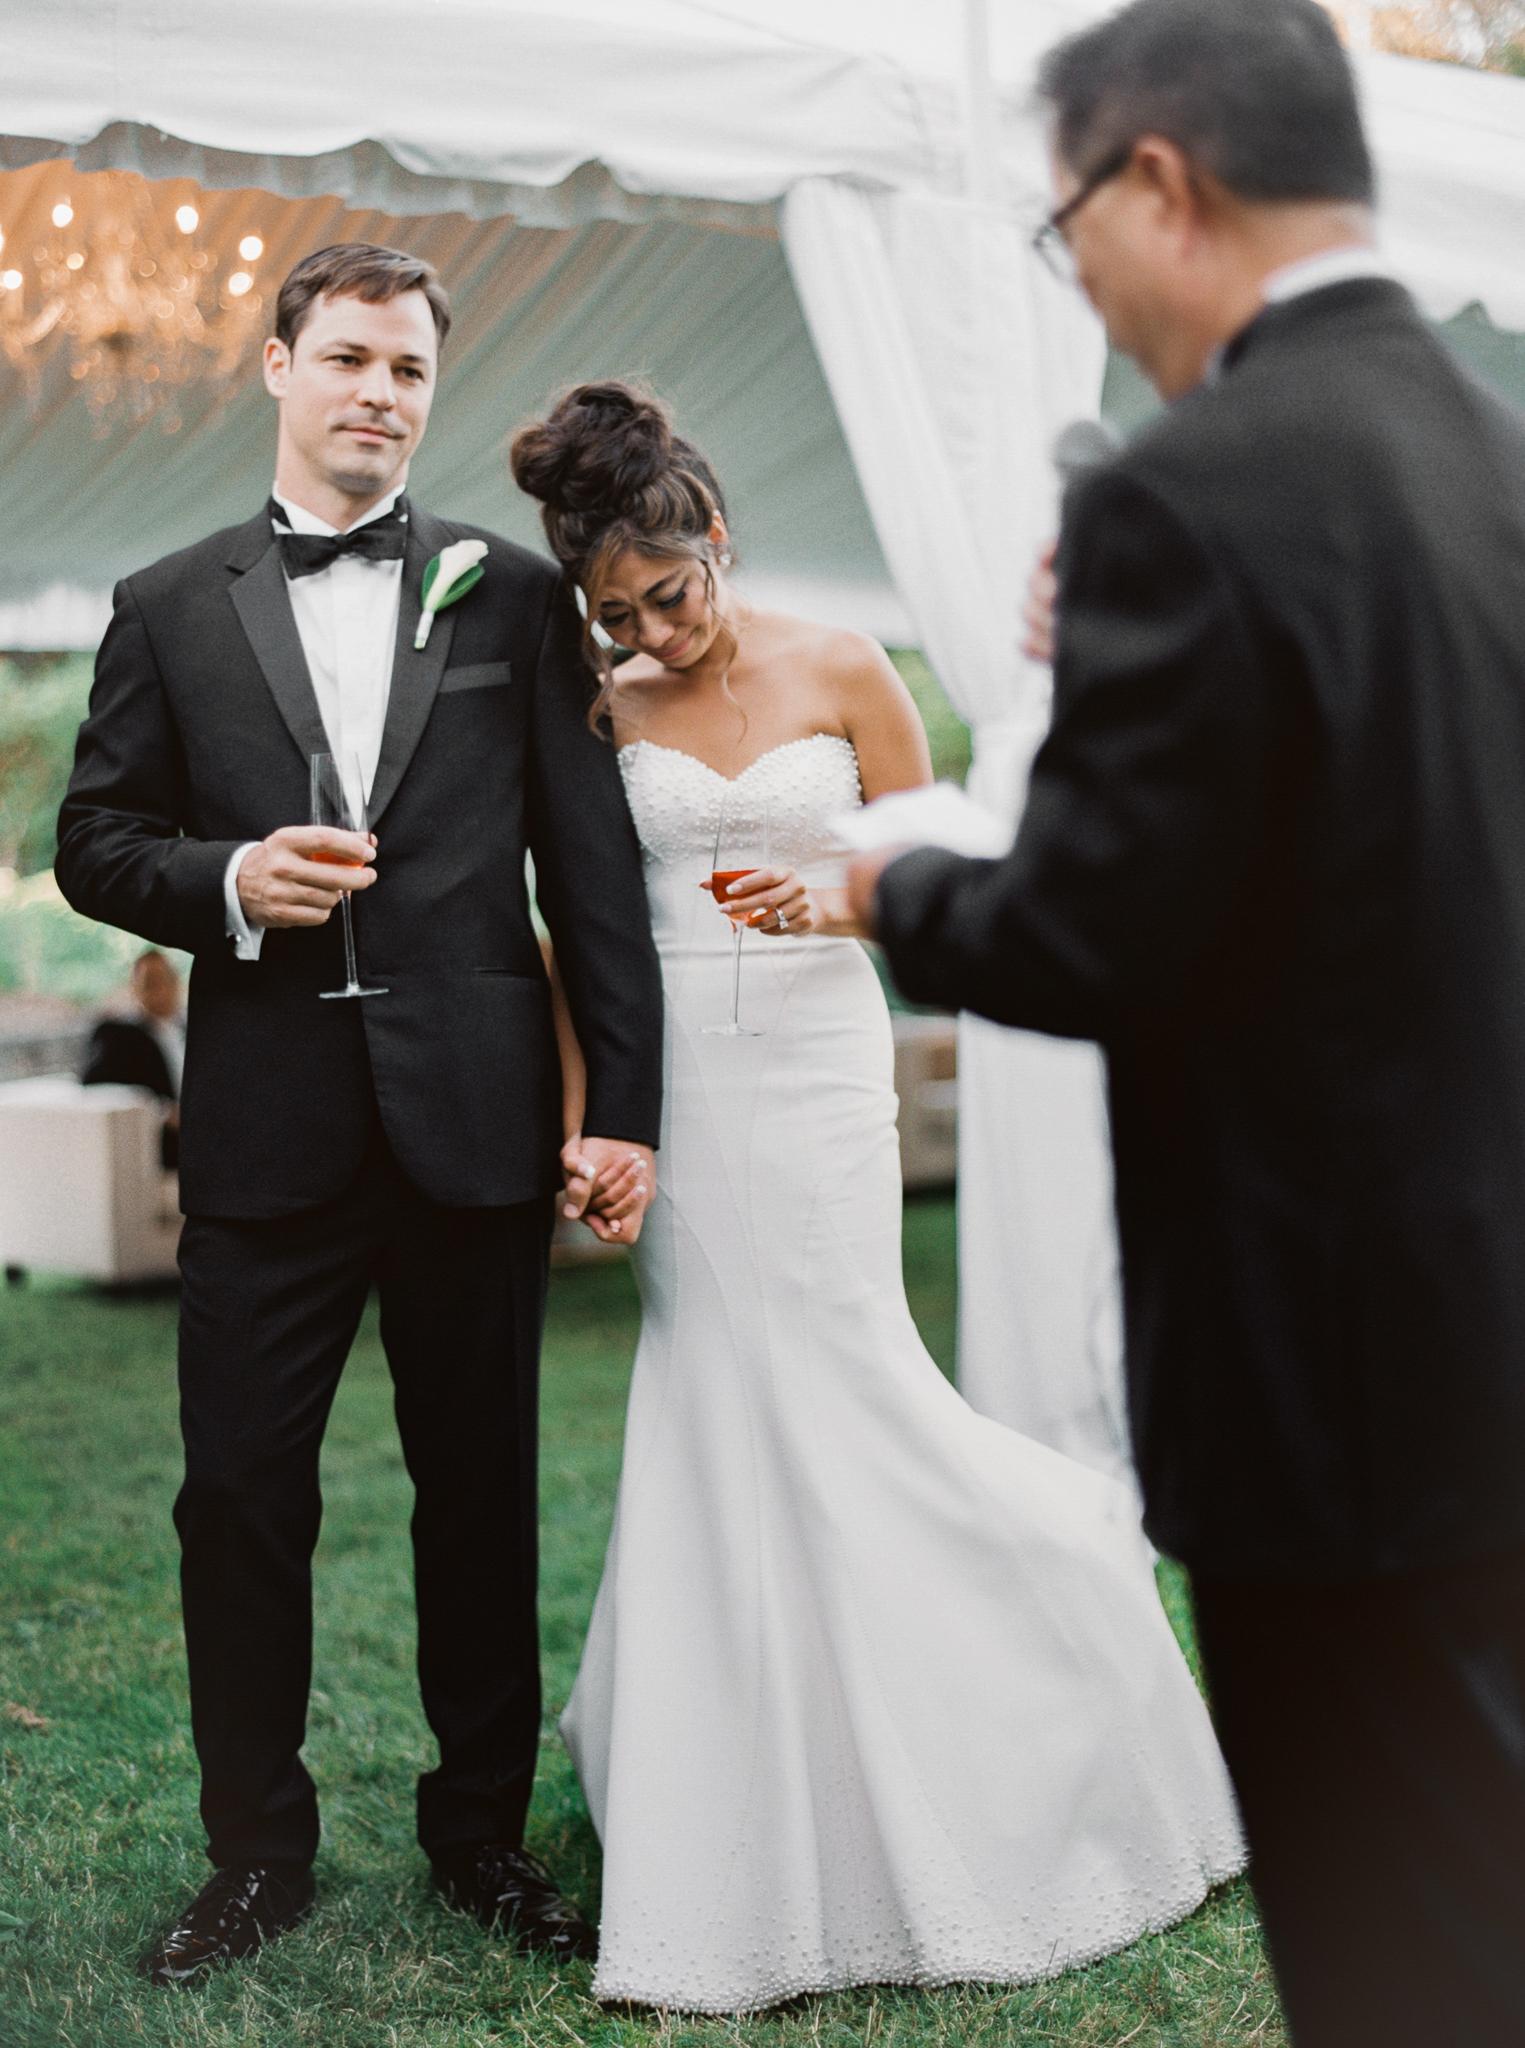 201OutliveCreative_Travel_Photographer_Videographer_Lewis&Clark_Oregon_Elegant_BlackTie_Destination_Wedding.jpg